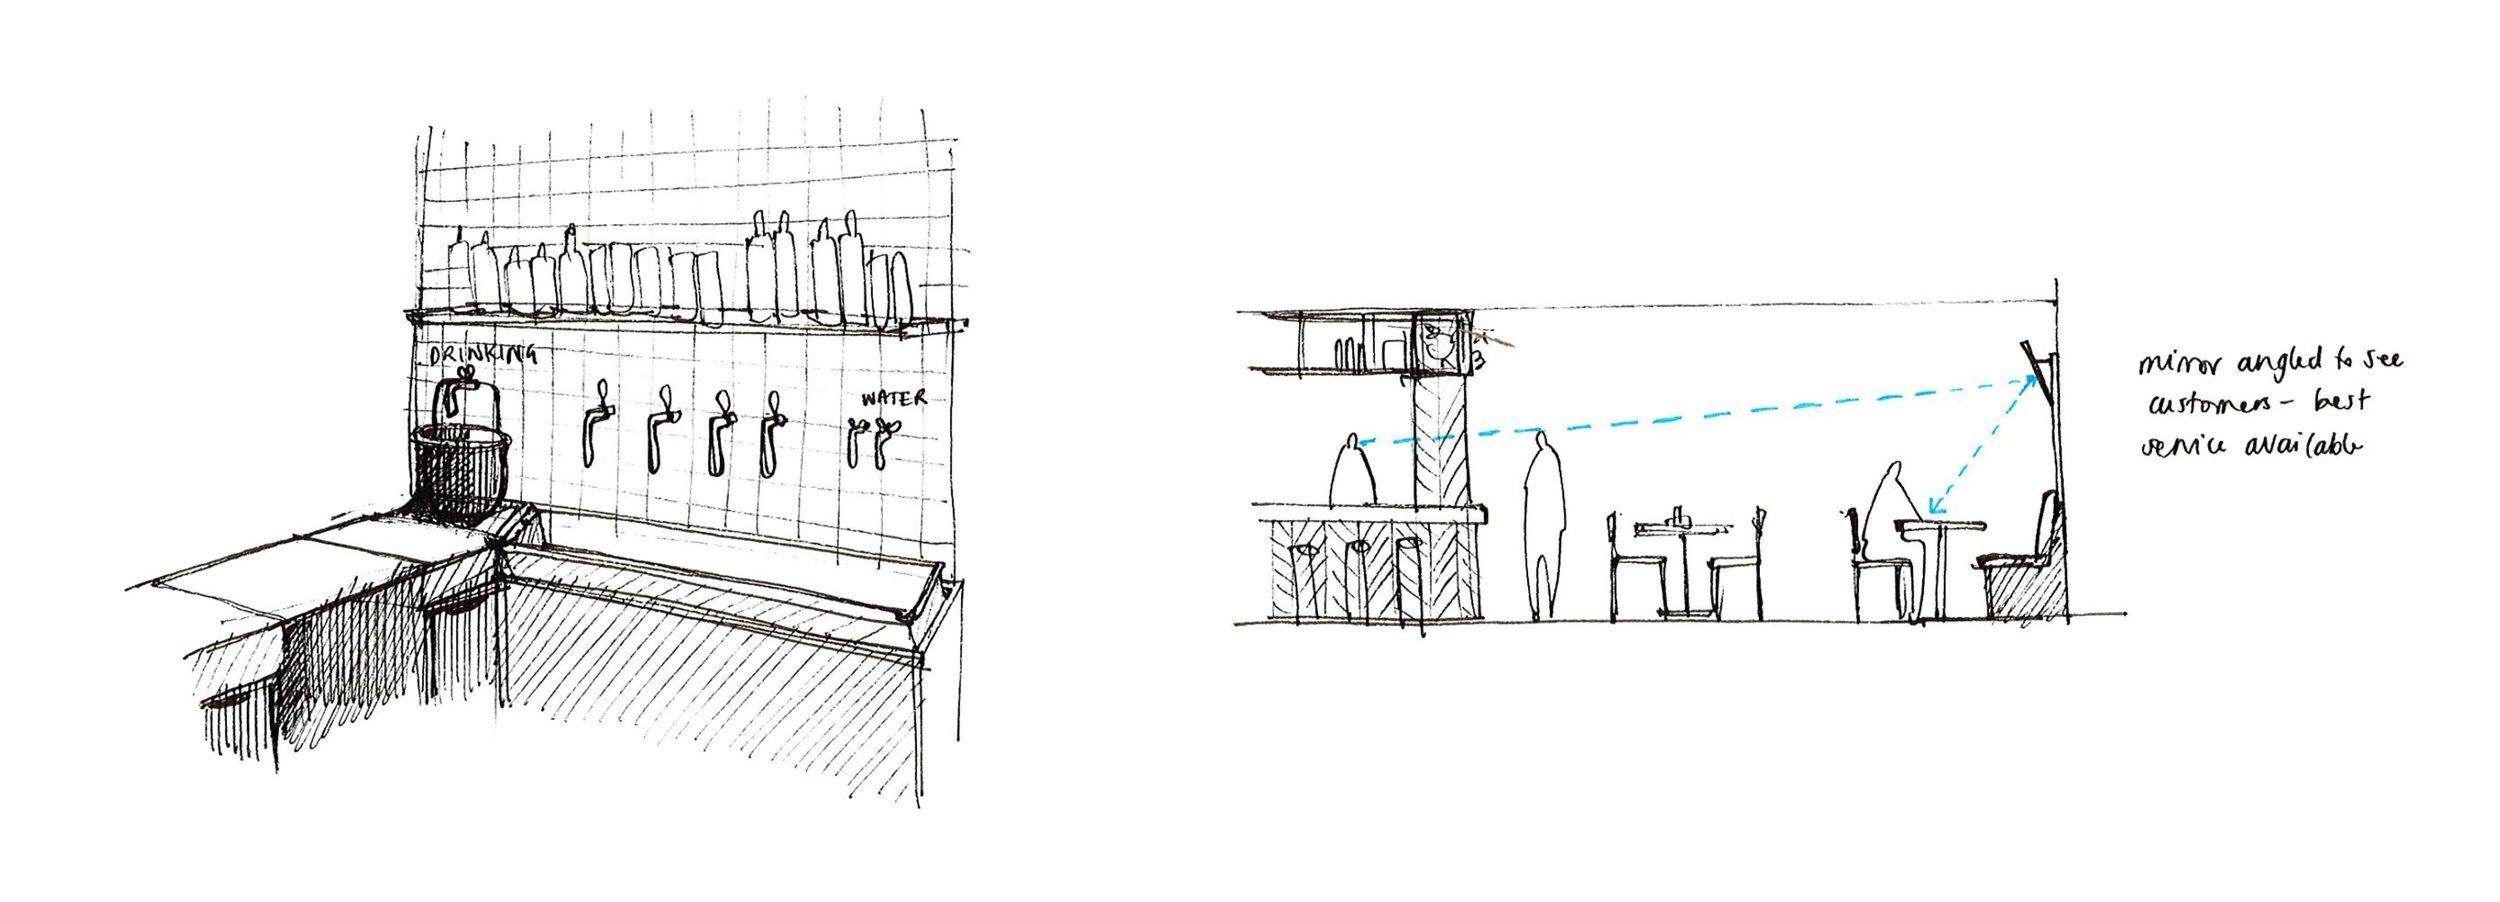 Pigsty Interior Sketches